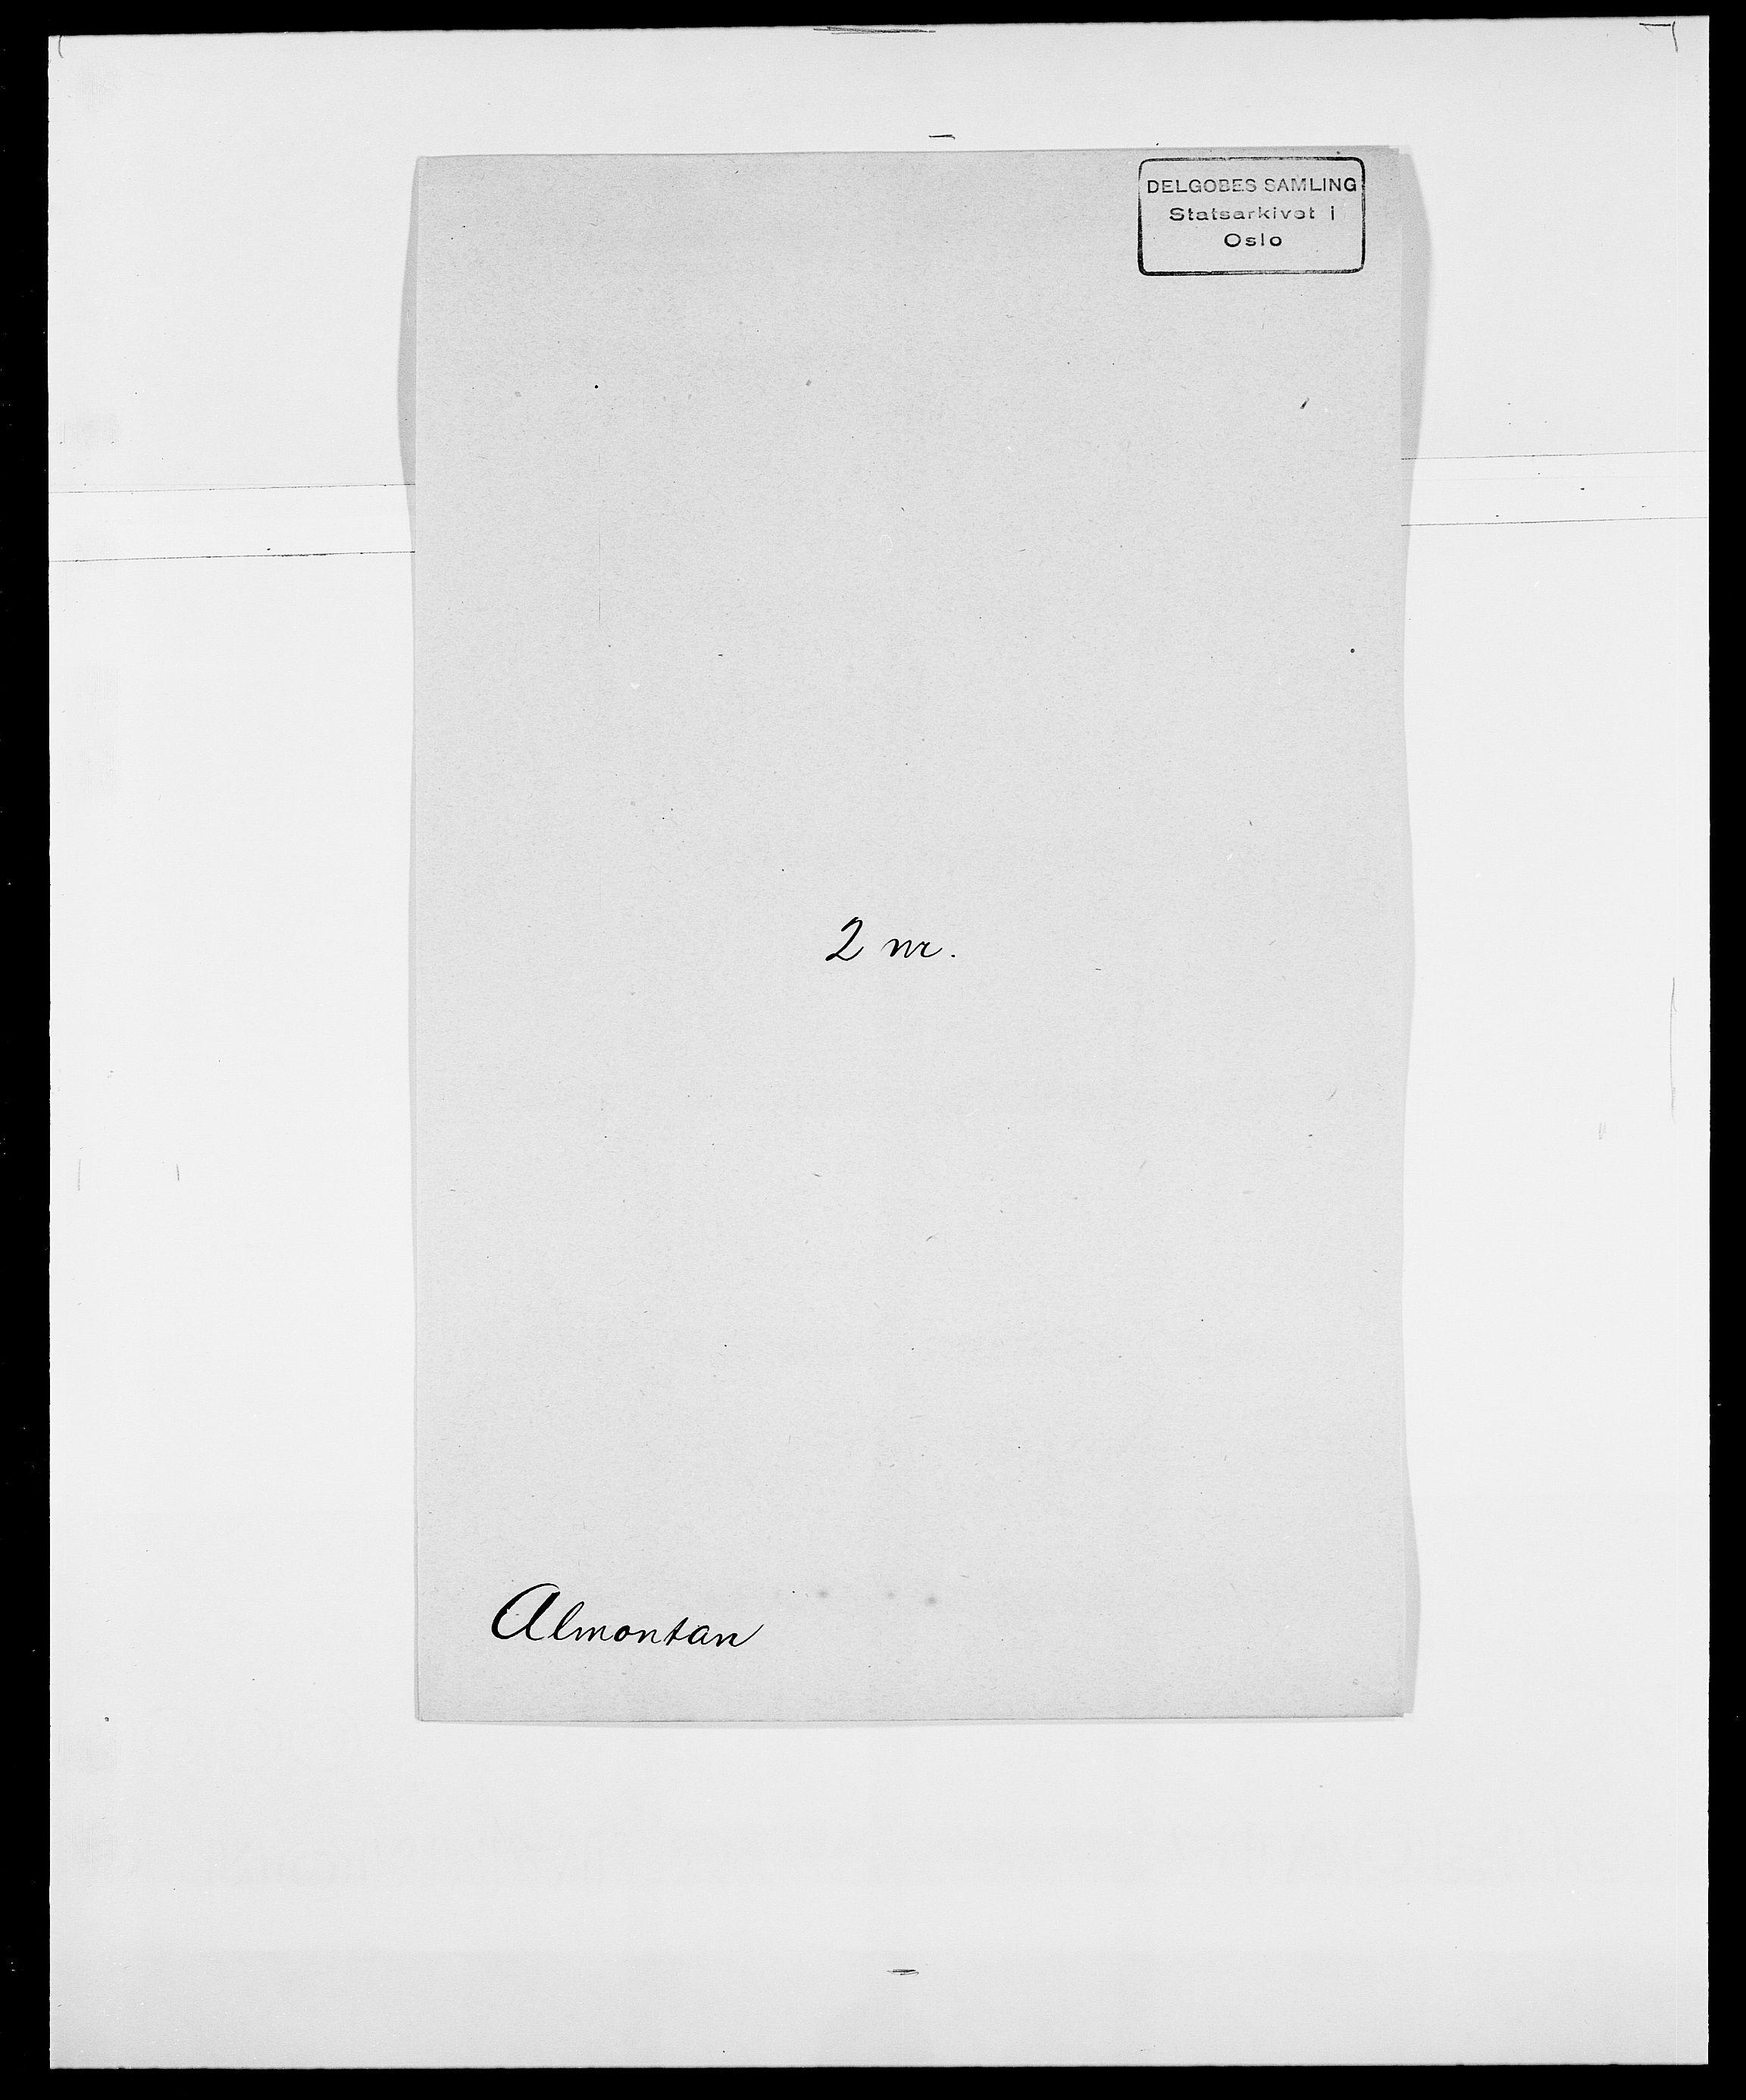 SAO, Delgobe, Charles Antoine - samling, D/Da/L0001: Aabye - Angerman, s. 444